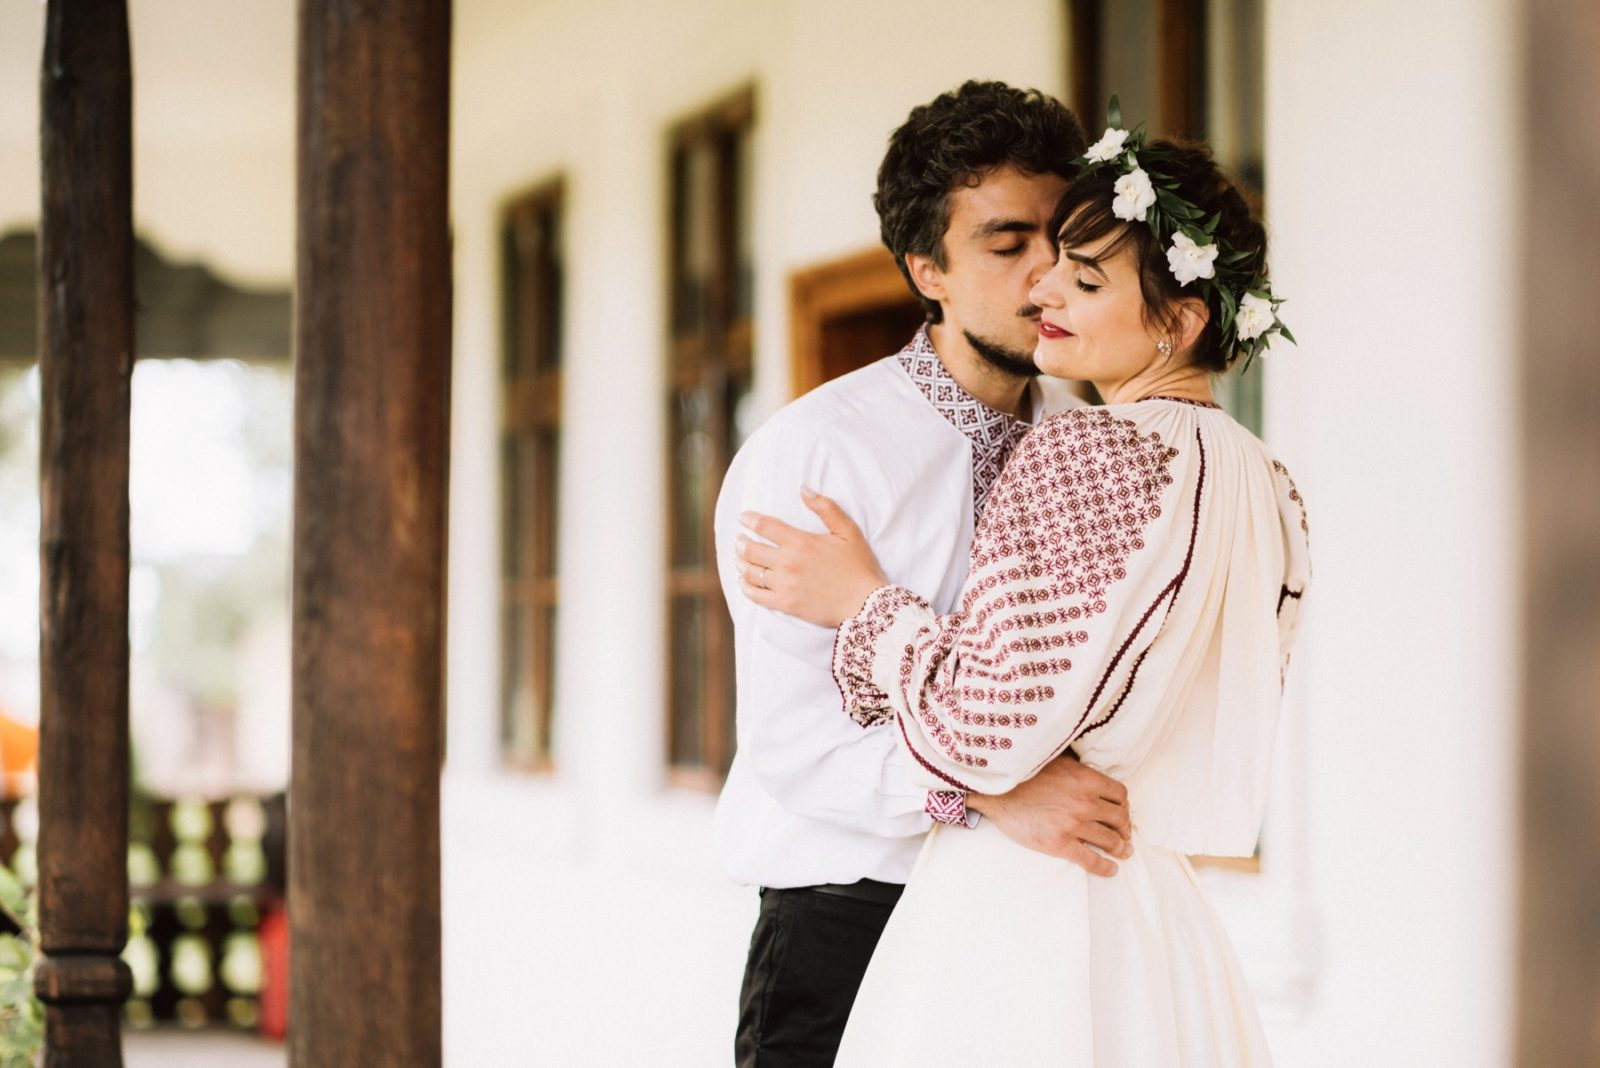 äktenskap inte dejta asiatisk wiki